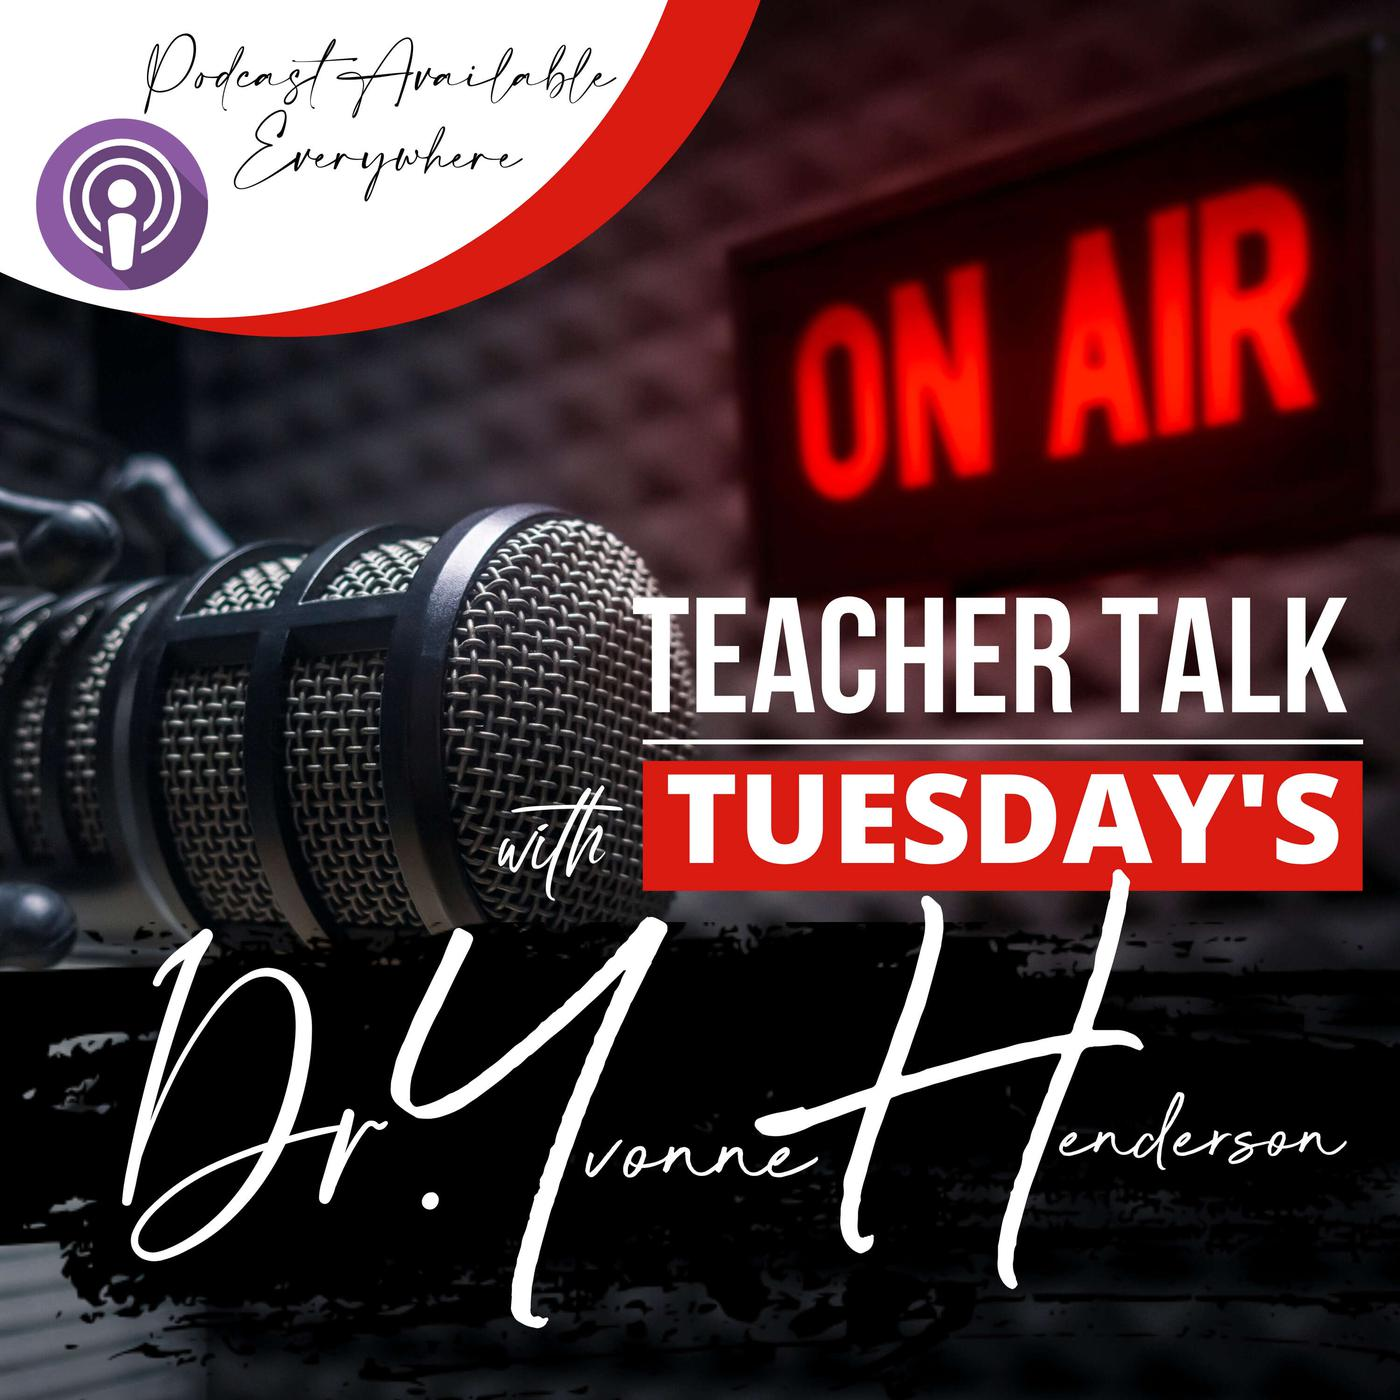 Teacher Talk 2uesday's (podcast) - Dr. Yvonne Henderson | Listen Notes